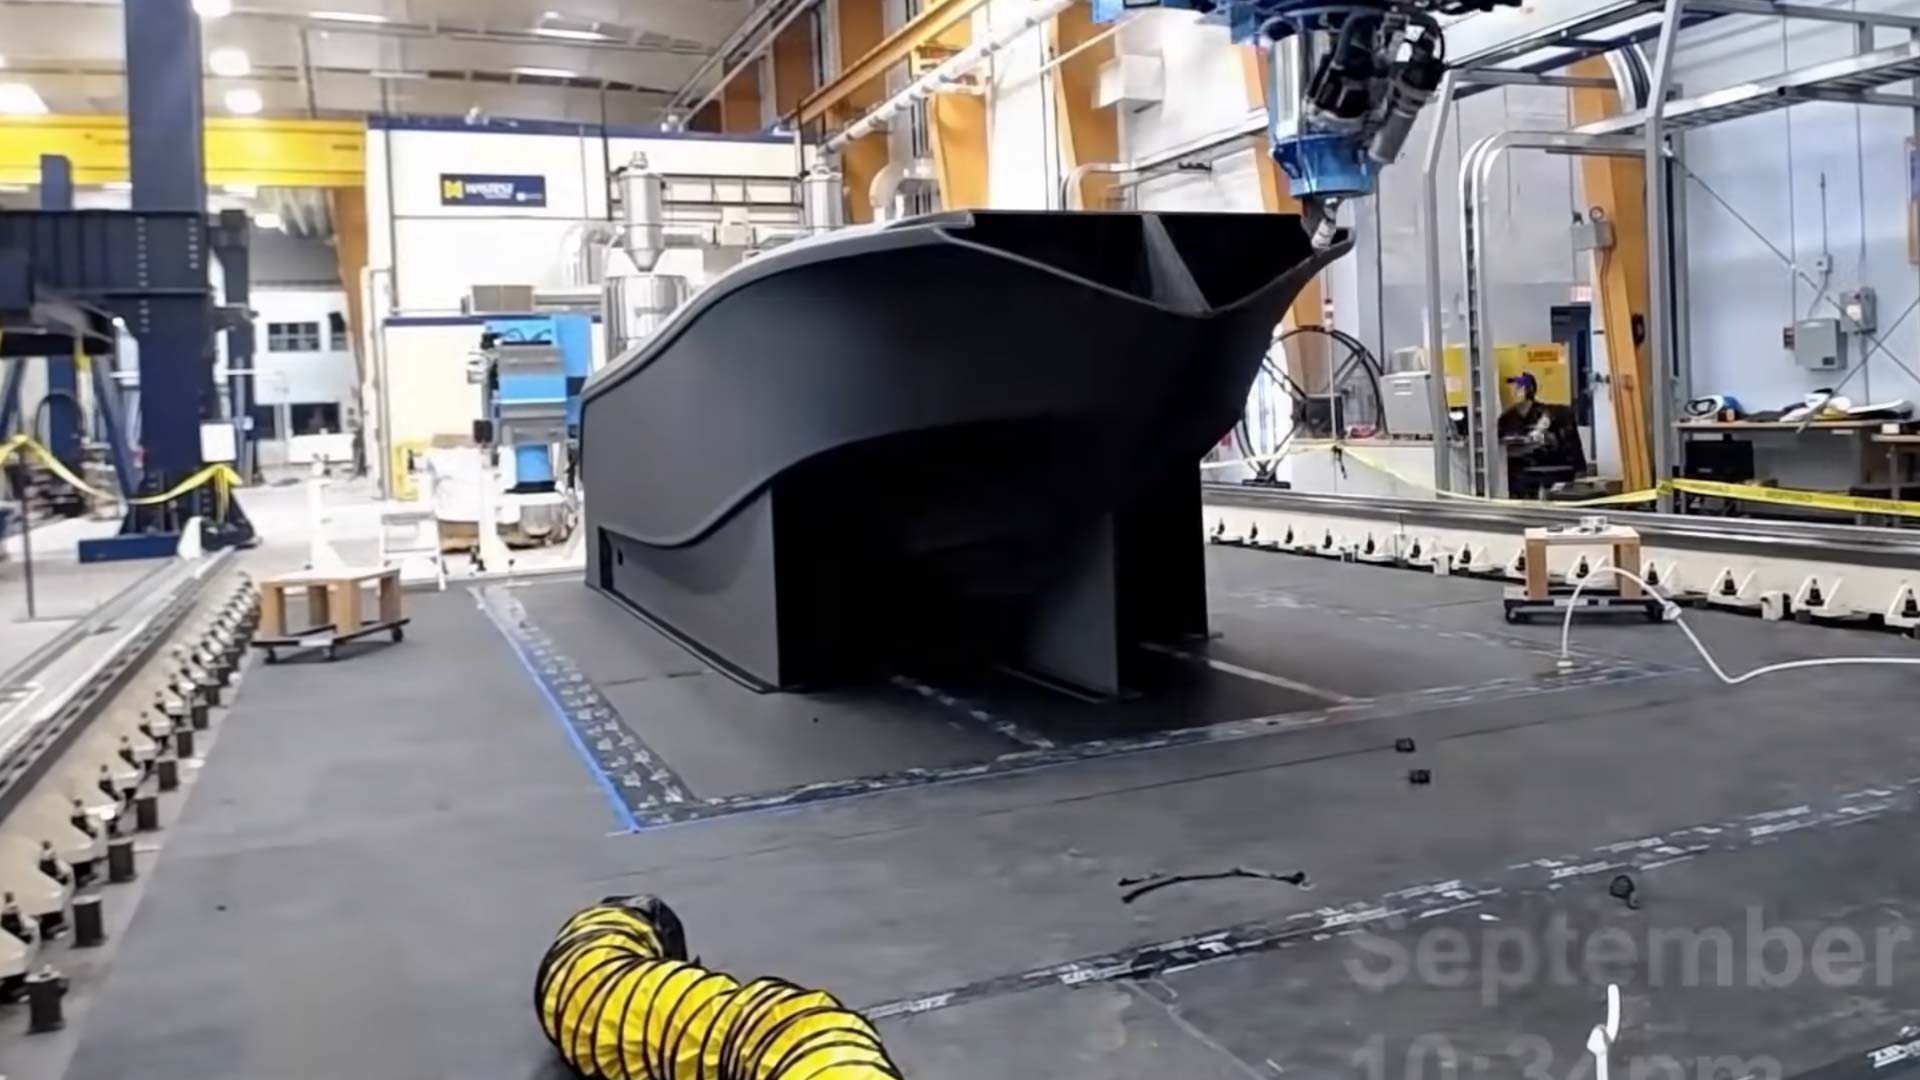 Barco impreso en 3D bate 3 récords Guinness